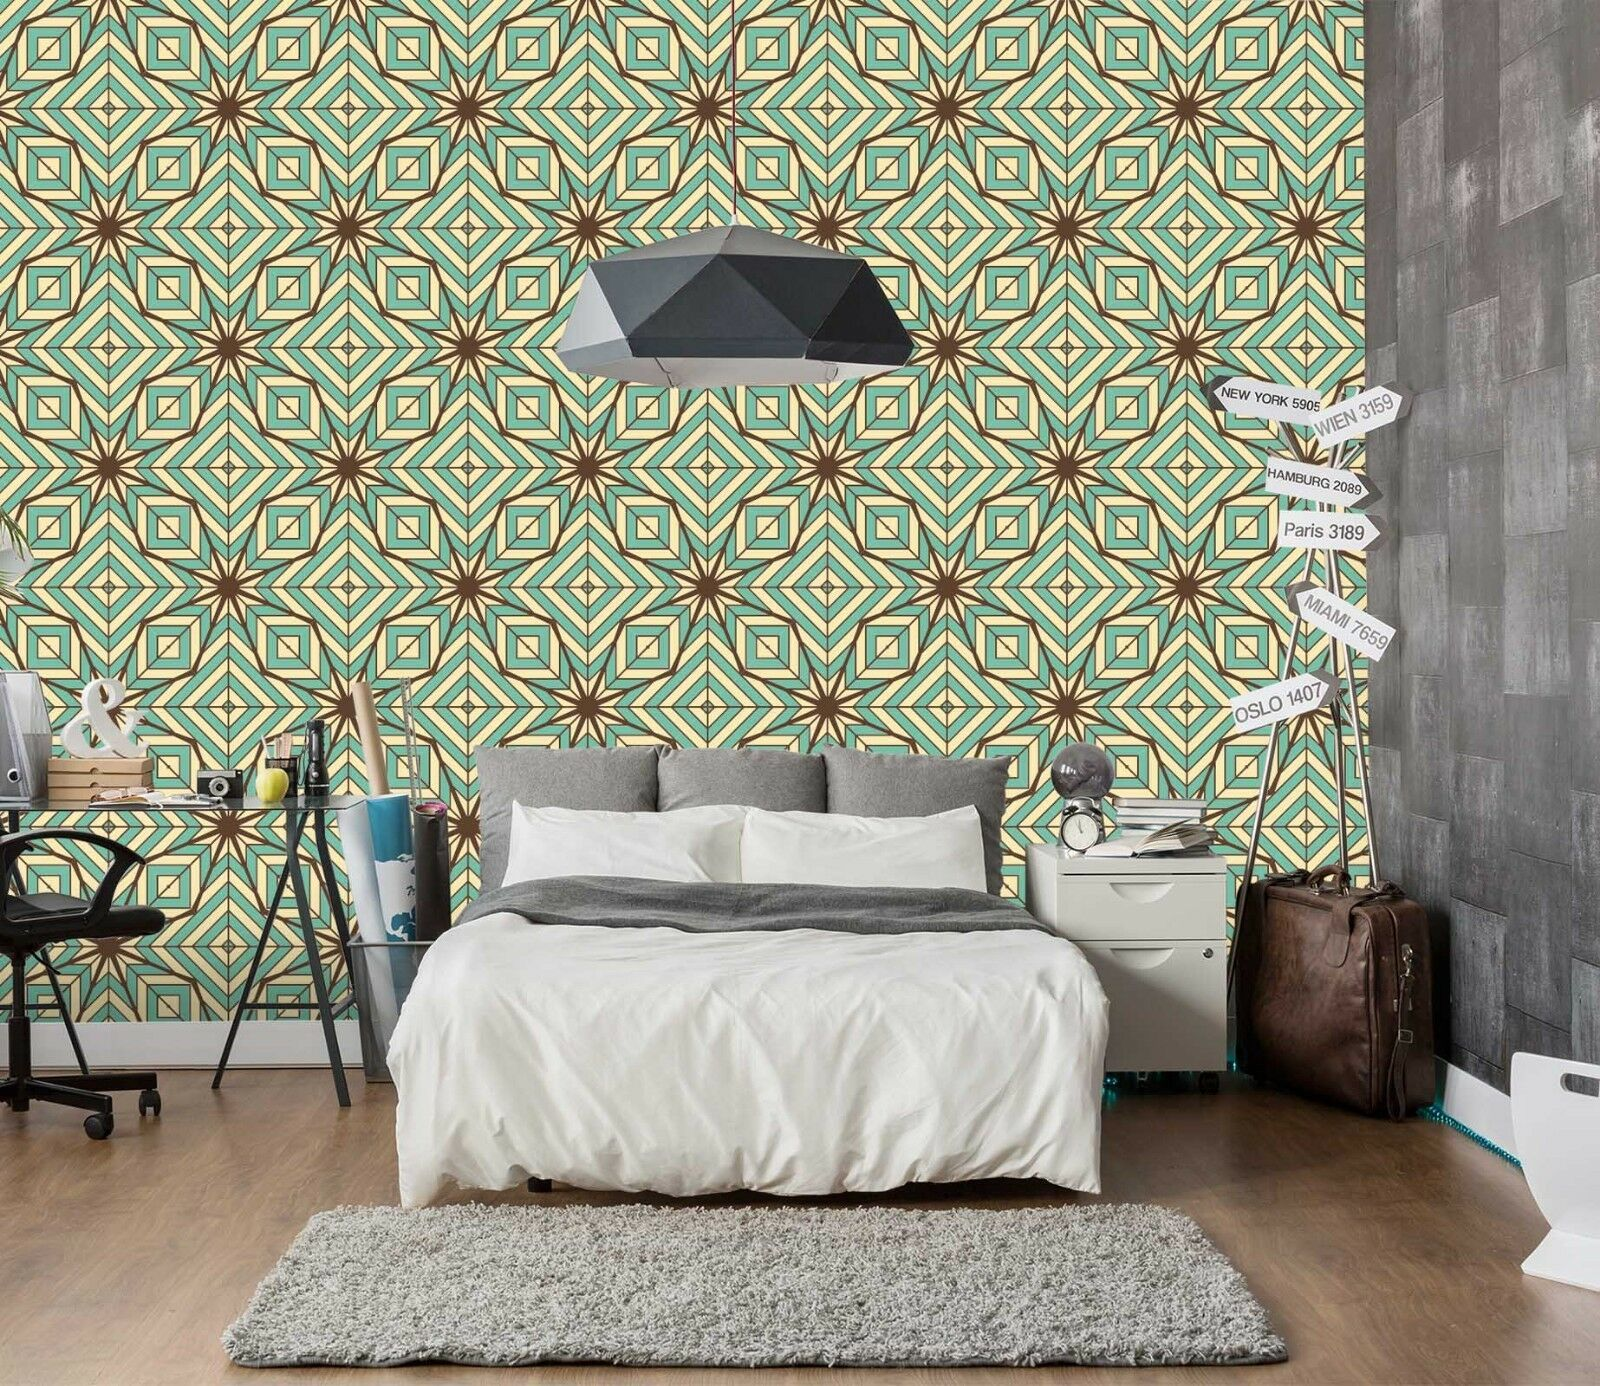 3D Abstract Geometry 220 Wallpaper Mural Wall Print Decal Indoor Murals AU Lemon